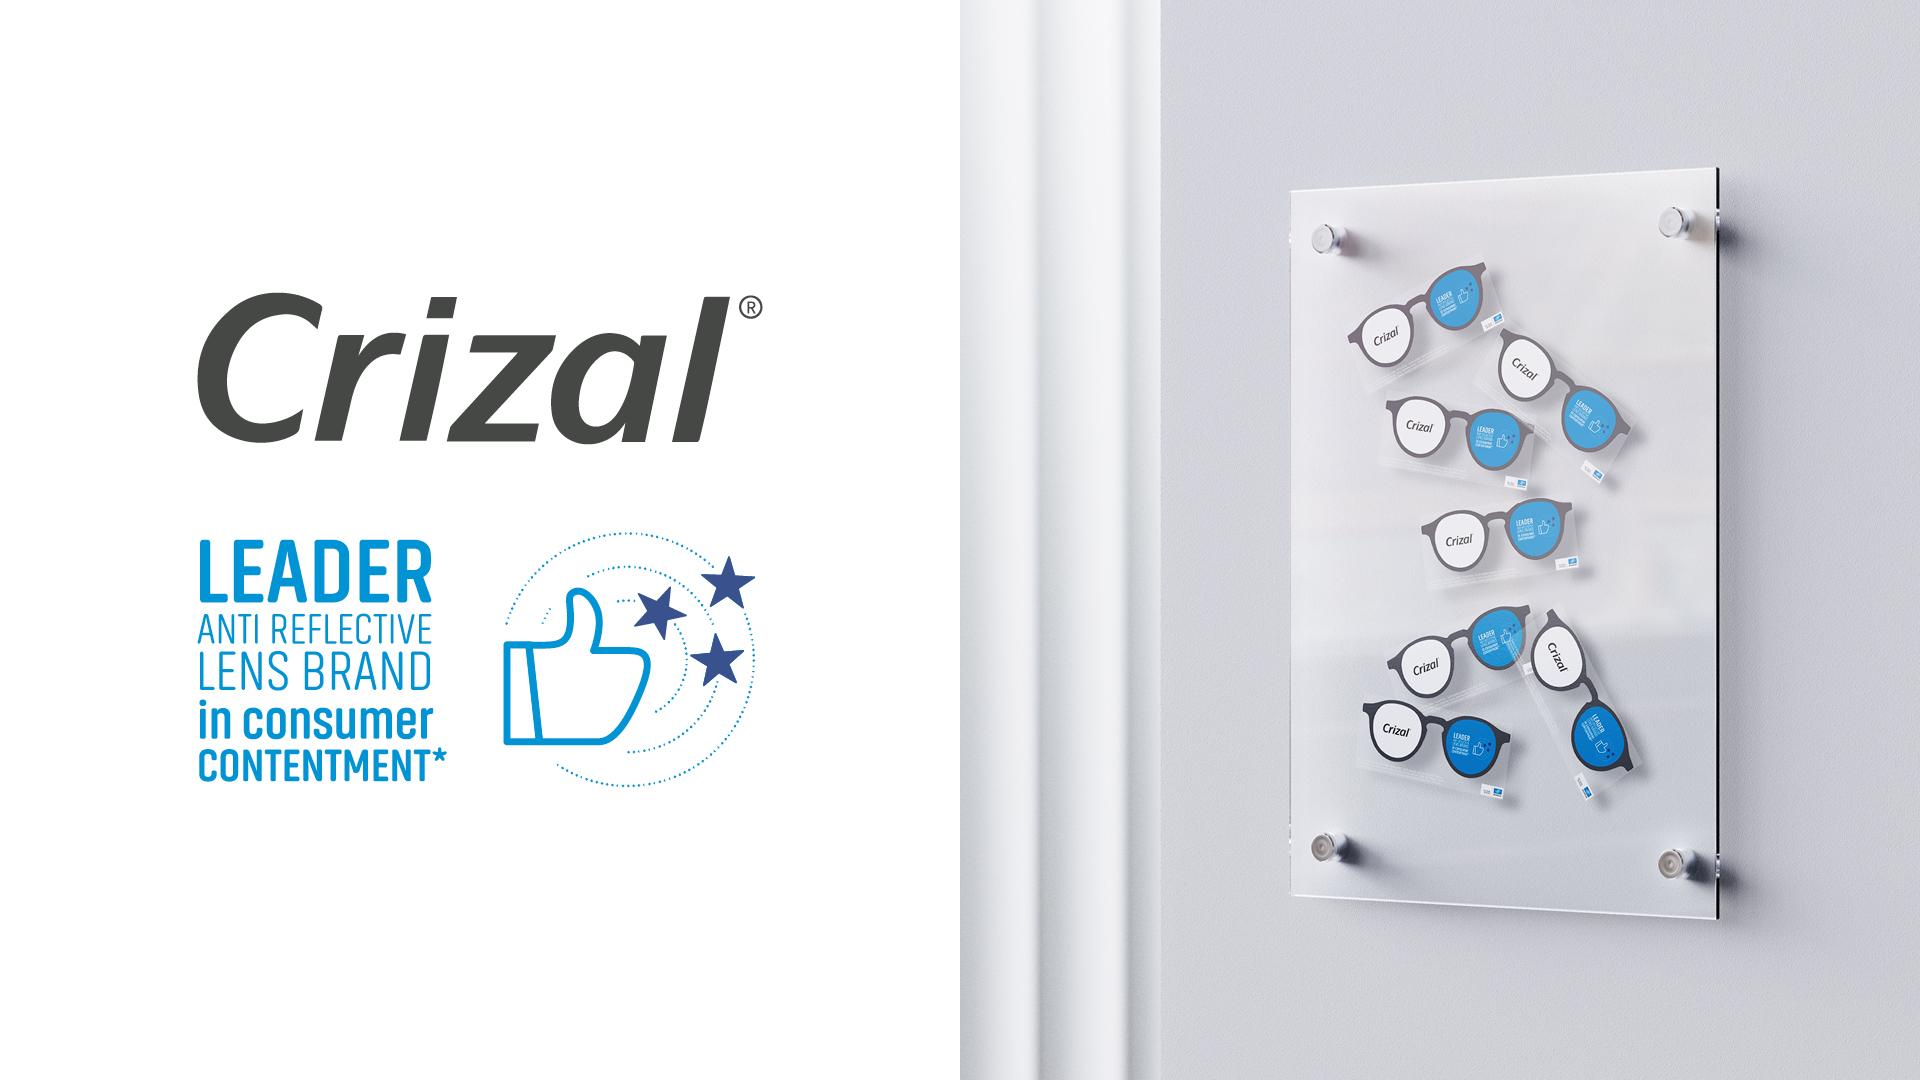 crizal_casclient10